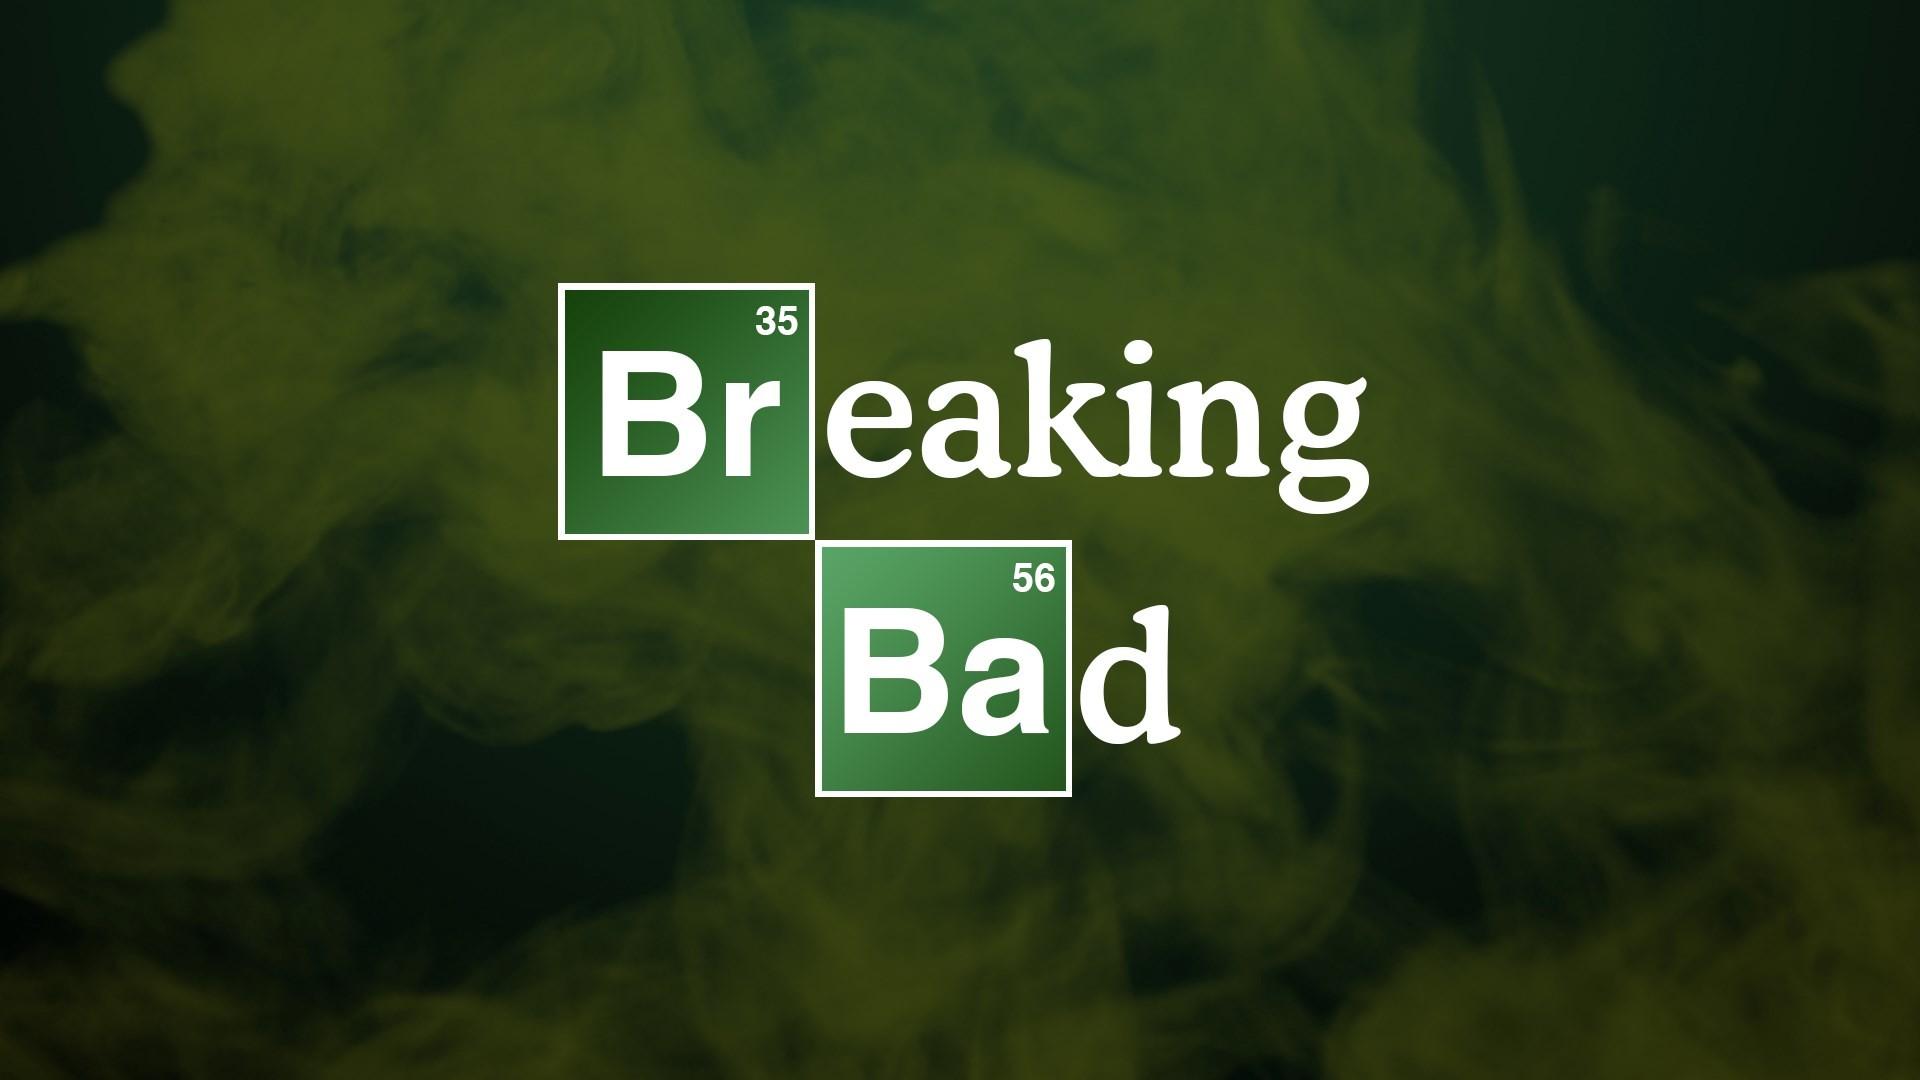 Prison Break Hd Wallpapers Download Breaking Bad Wallpaper 76 Images